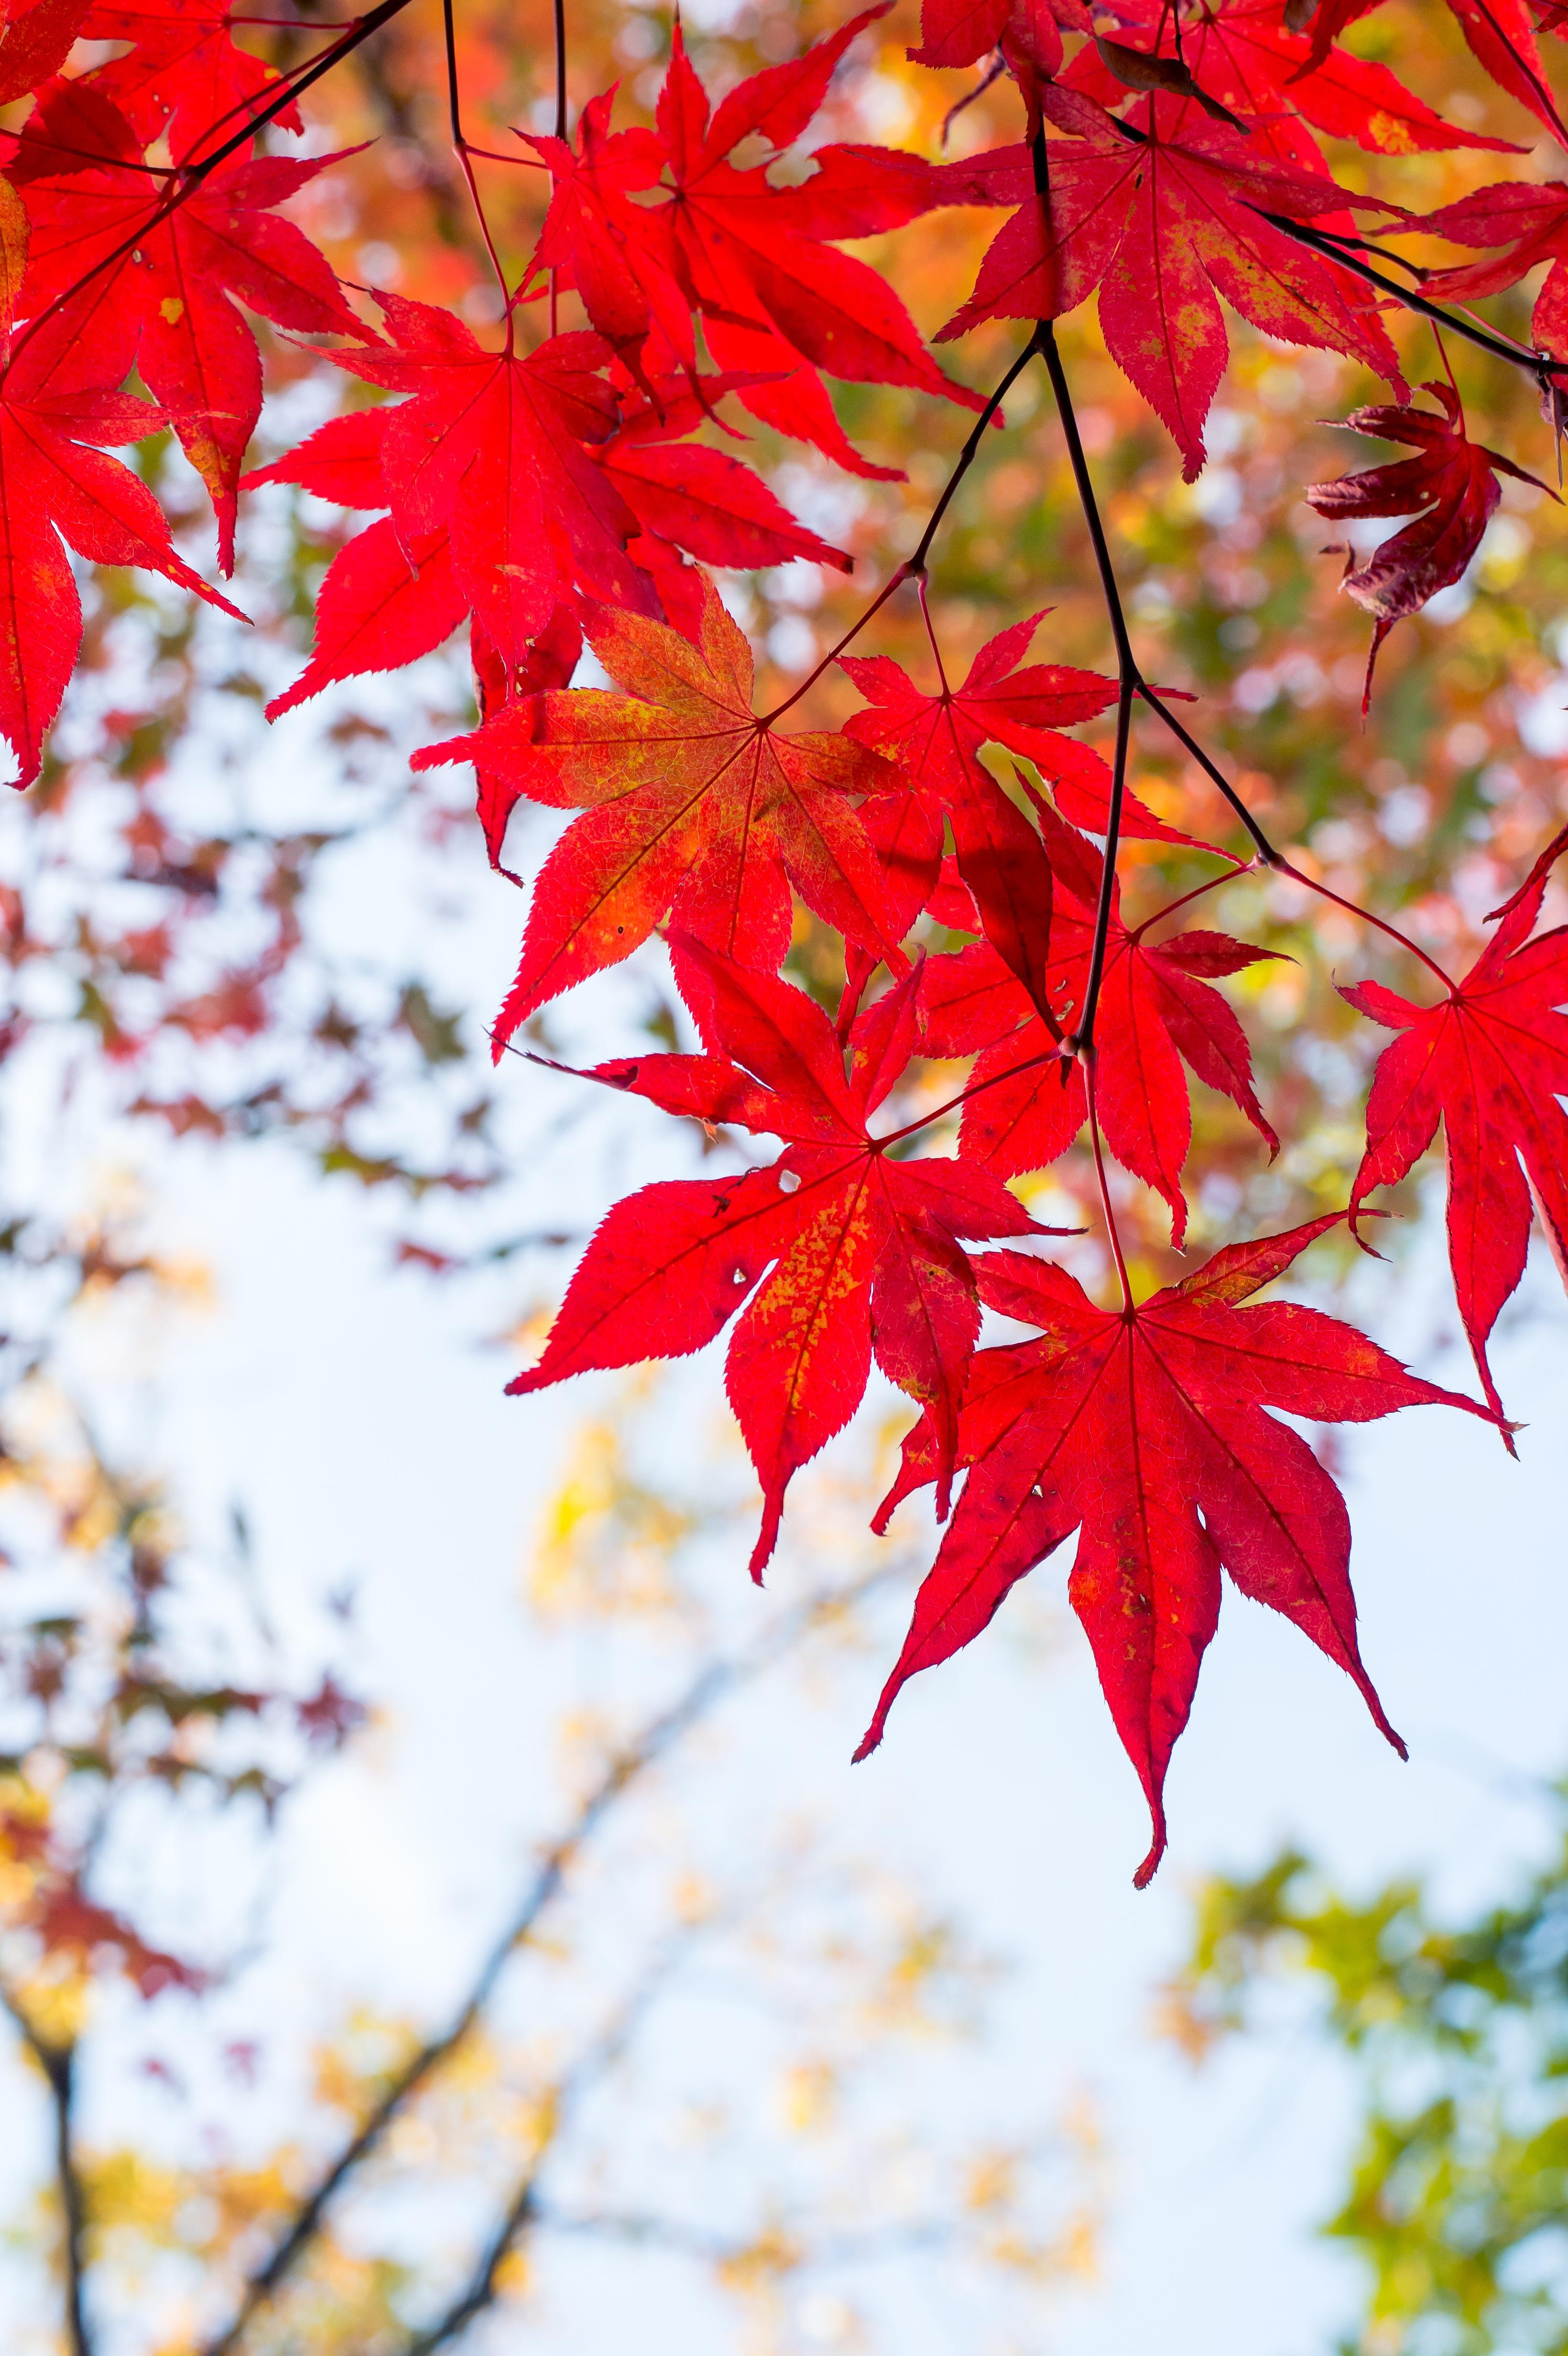 Flower Photography 무료 이미지 분기 목재 빨간 자연스러운 가을 일본 시즌 단풍 나무 단풍잎 카에데 꽃